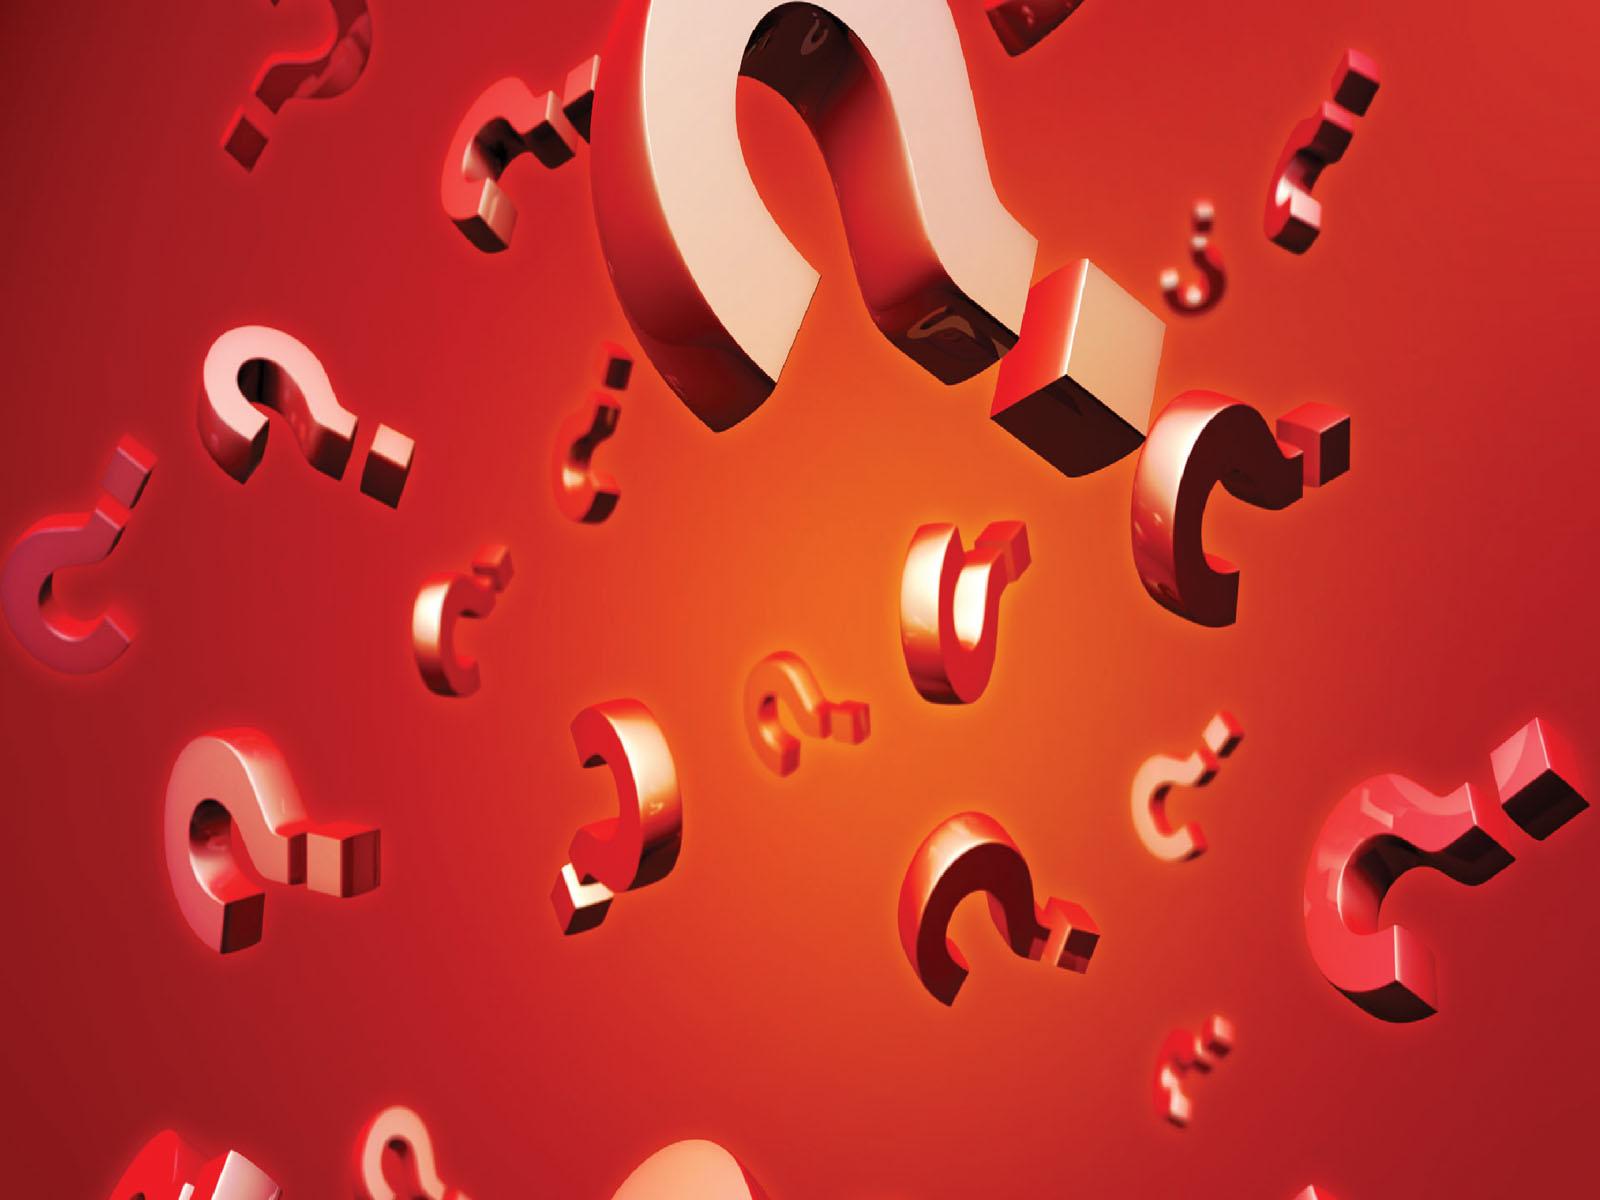 question mark Computer Wallpapers Desktop Backgrounds 1600x1200 1600x1200